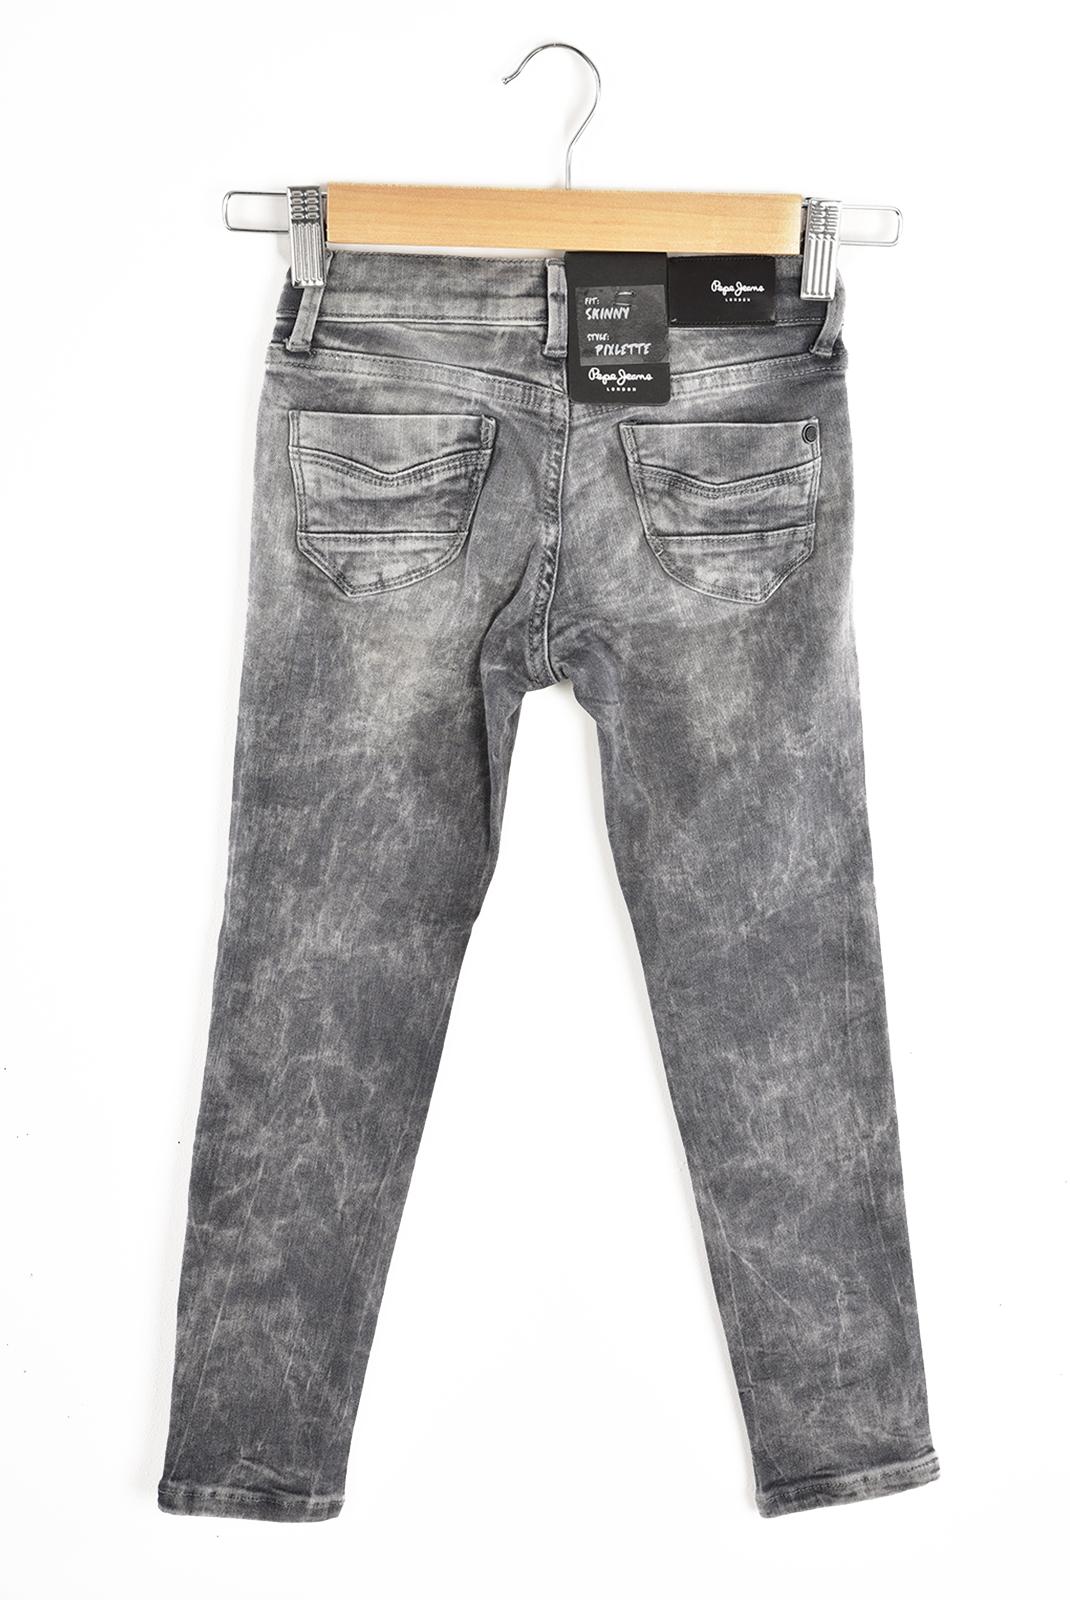 Bas  Pepe jeans PG200237 pixlette v88